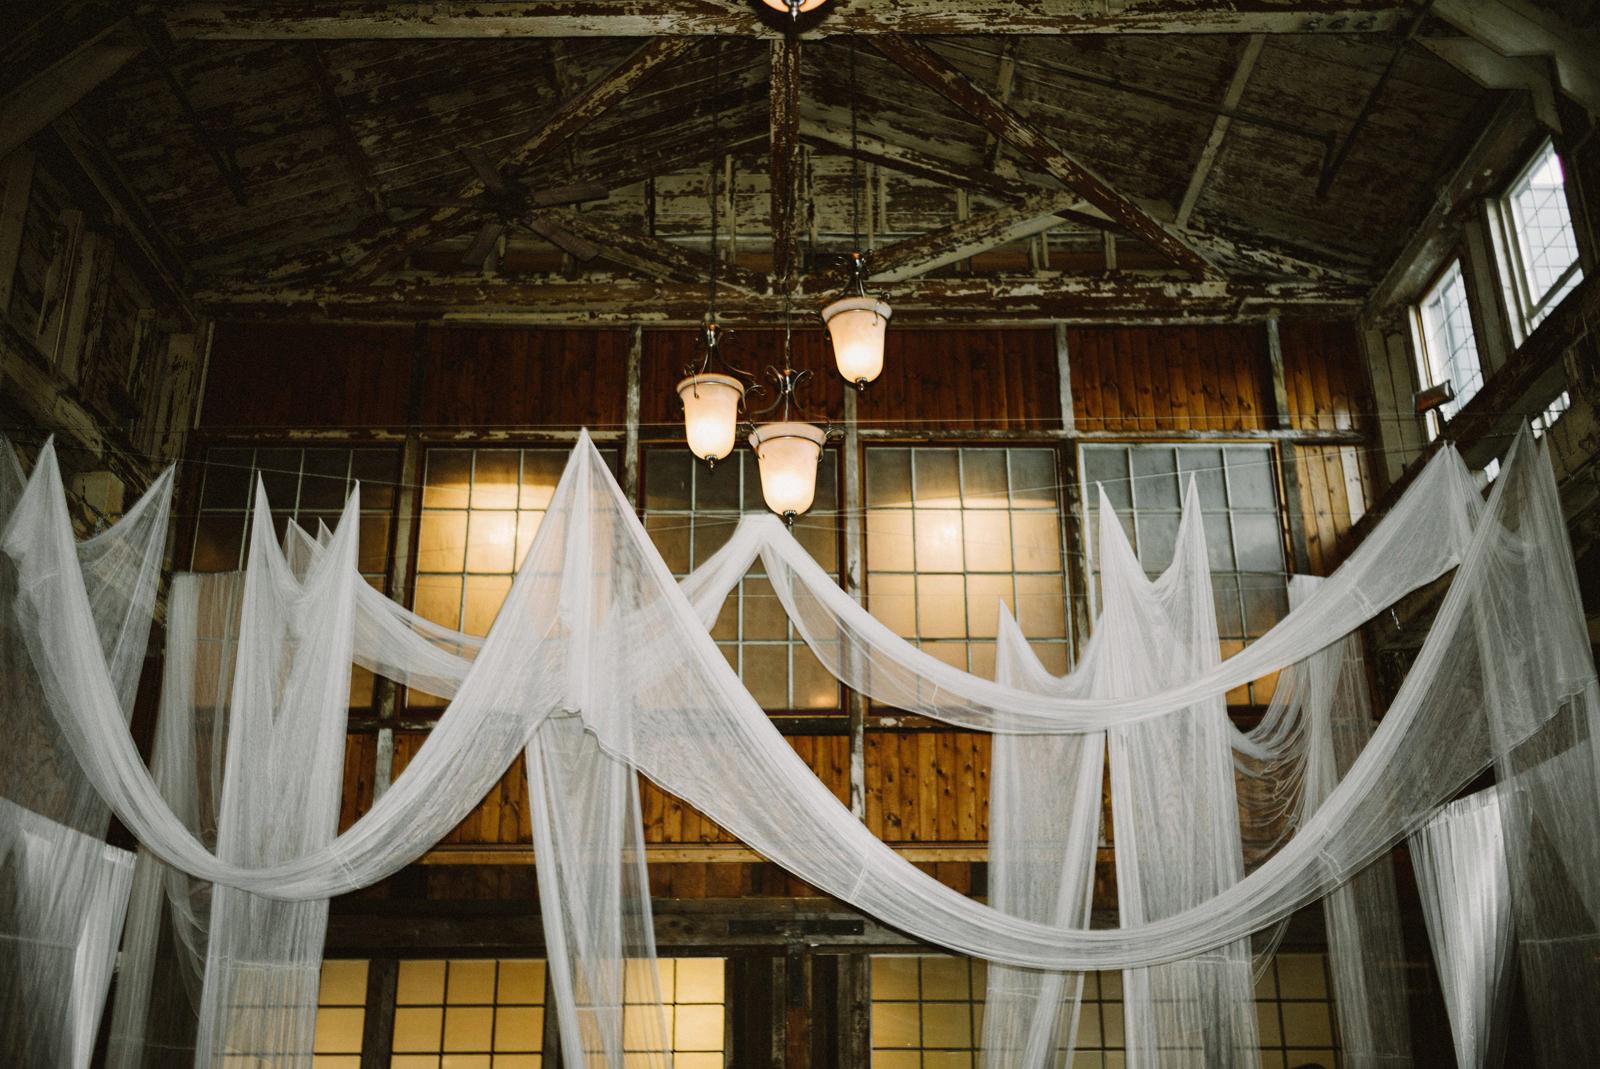 sodo-park-wedding-094 SODO PARK WEDDING